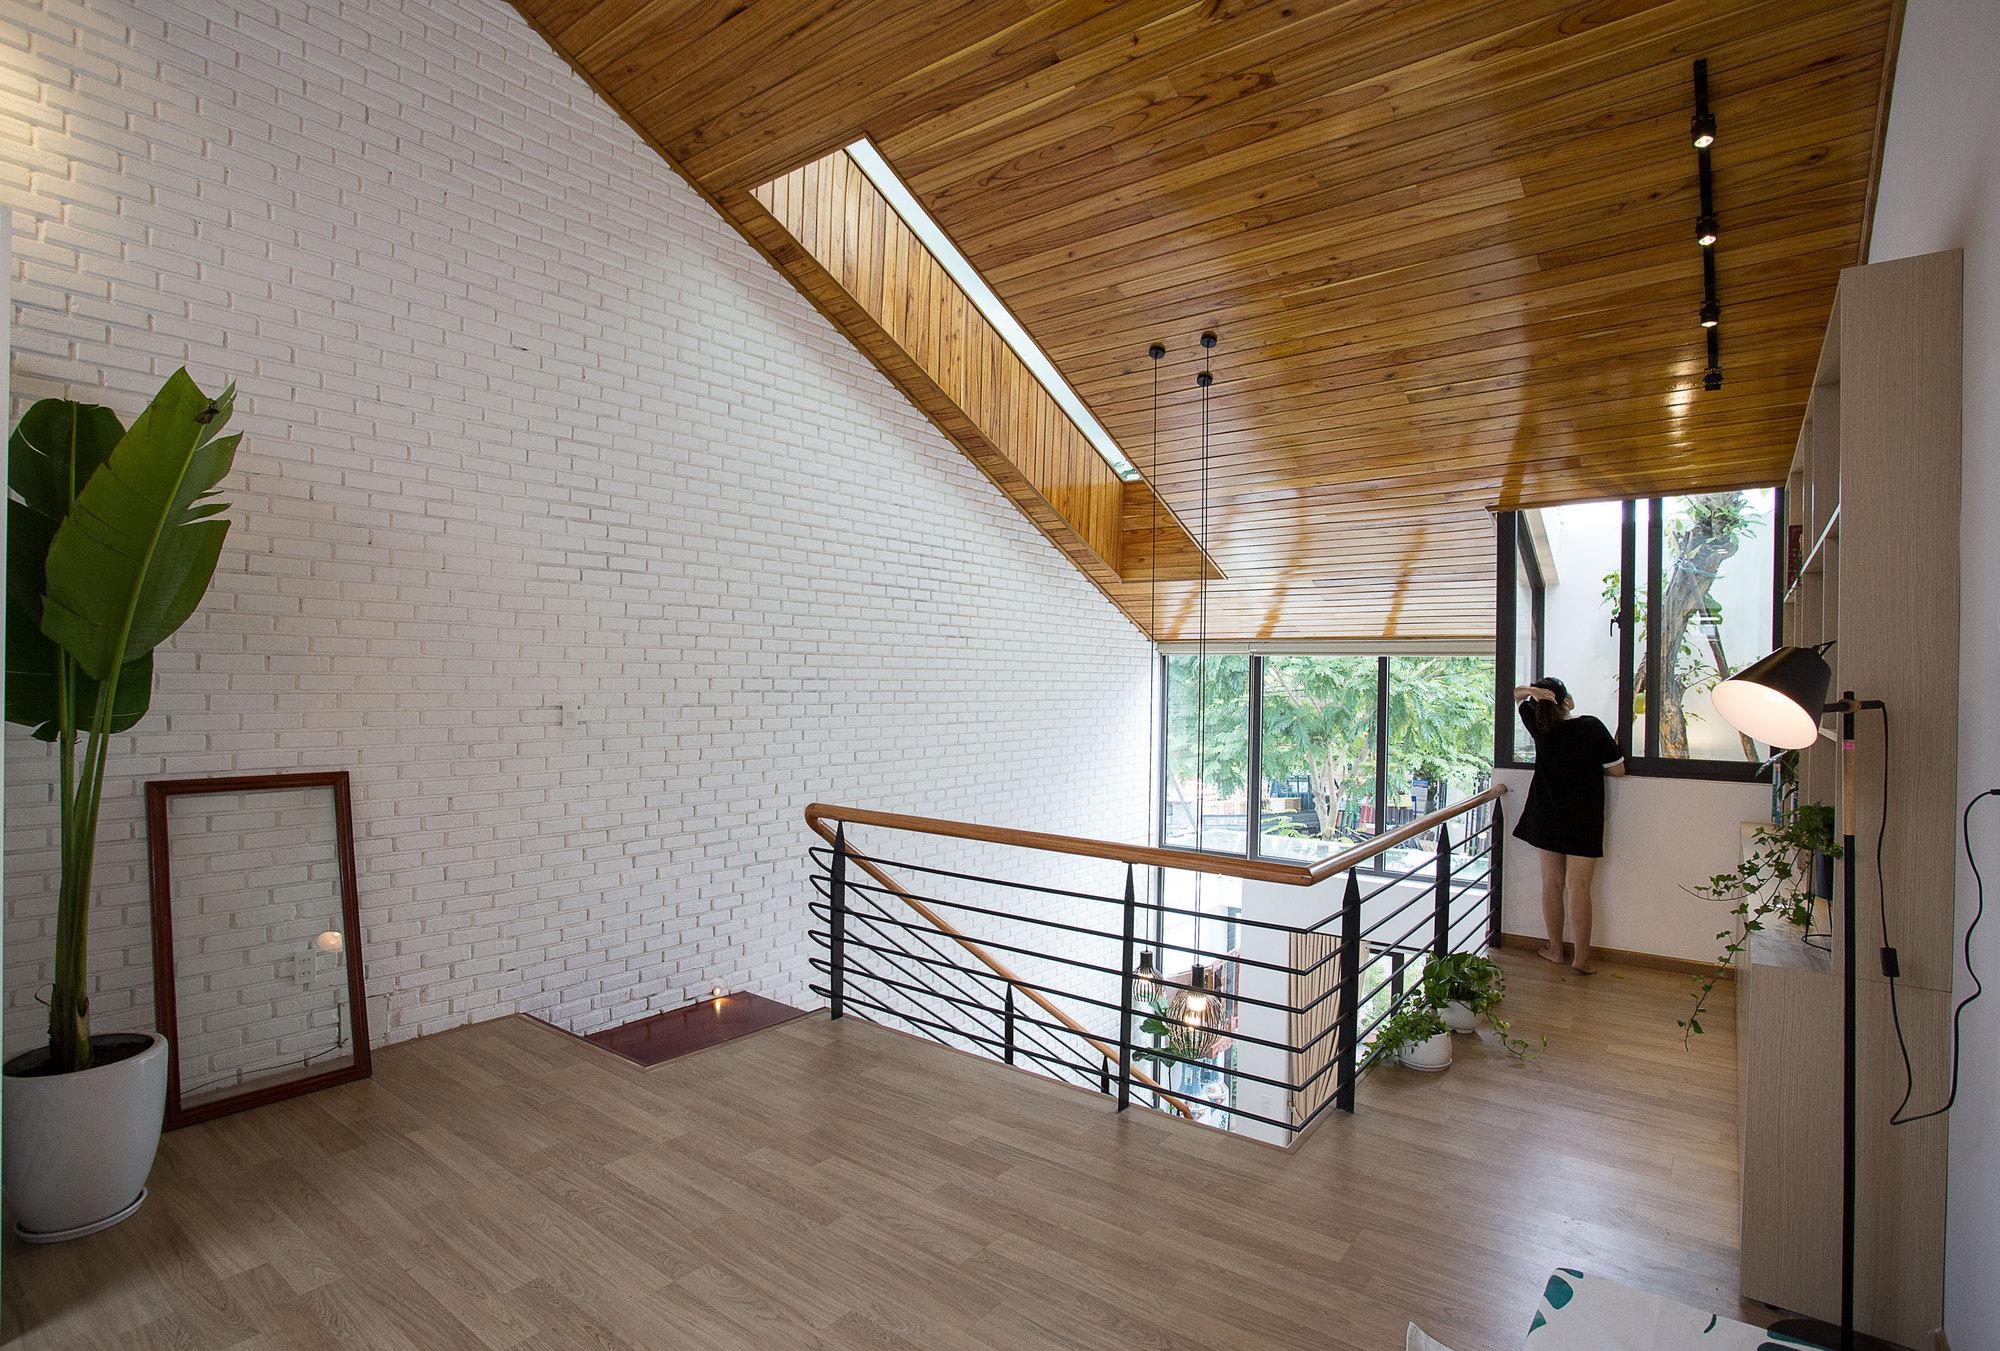 Minimalist House 85 Design - 9